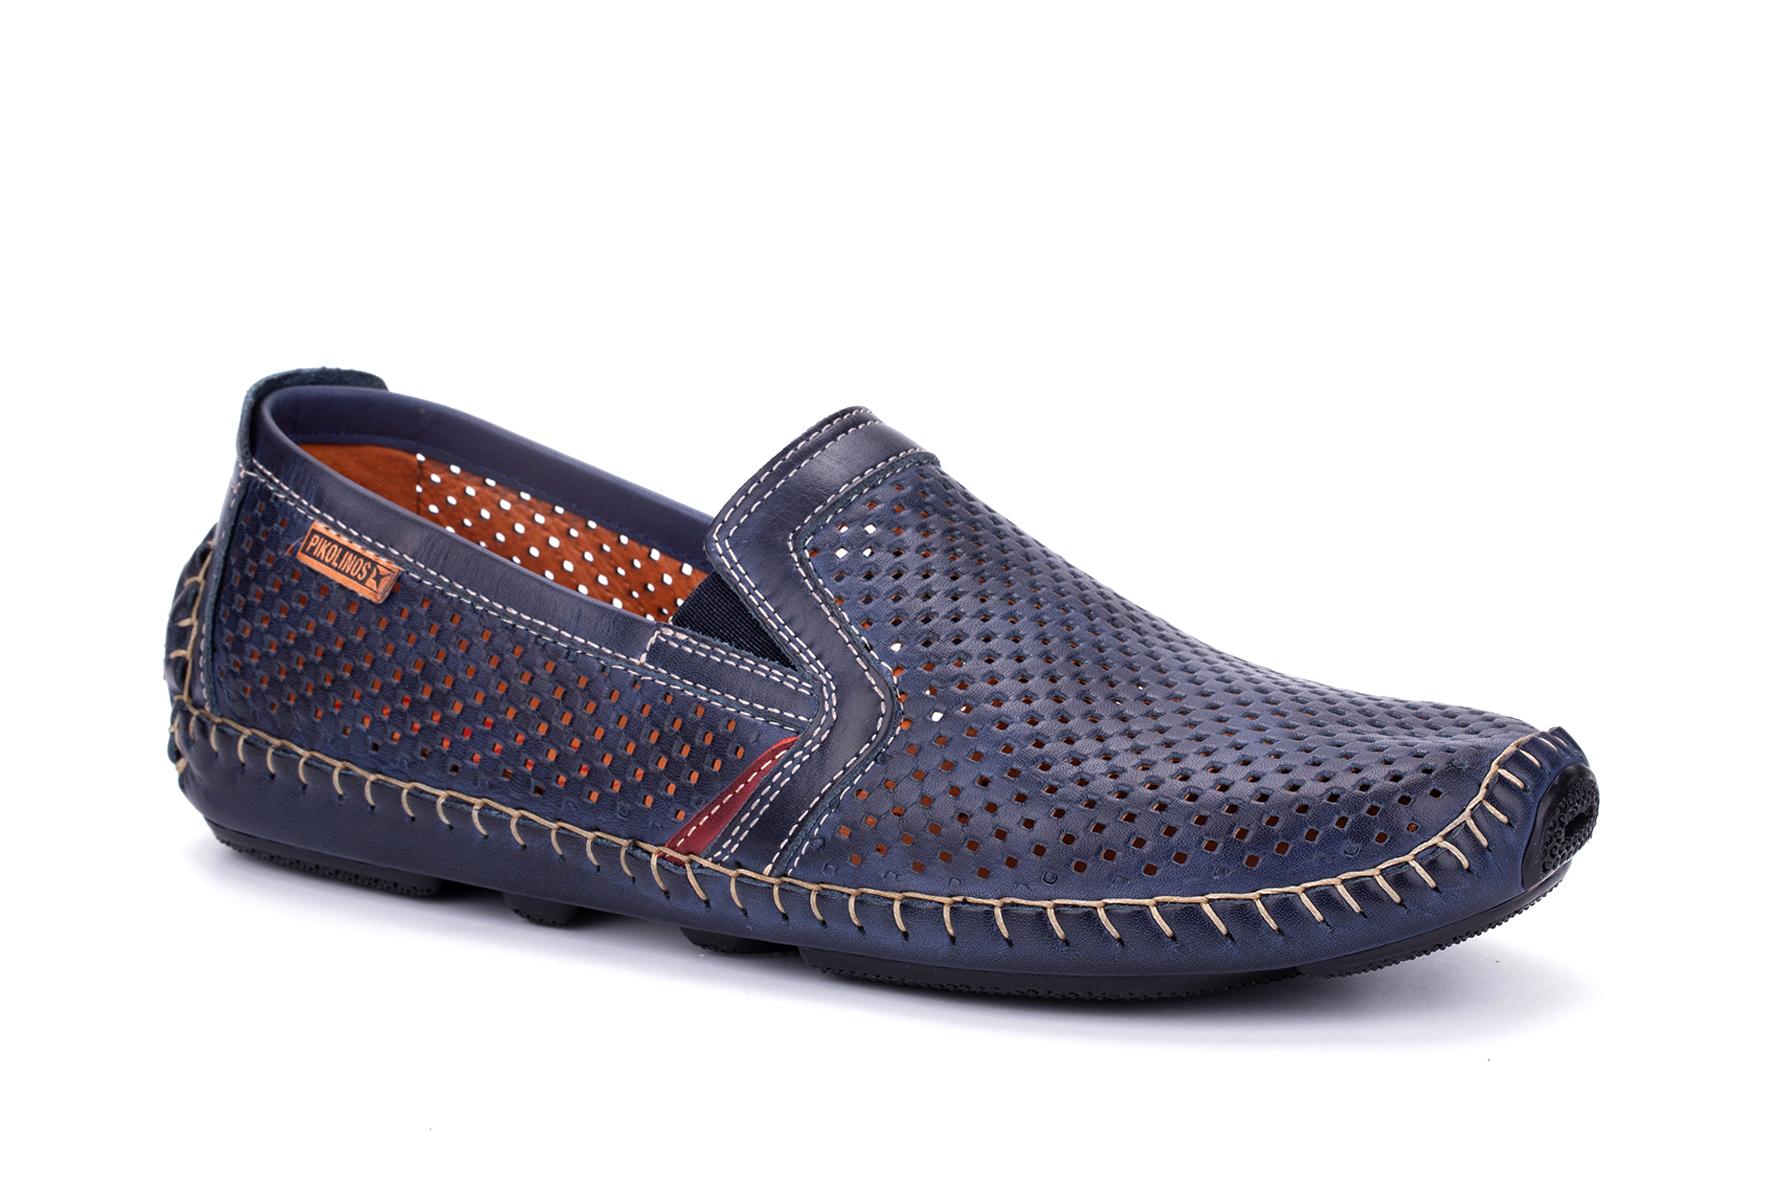 Pikolinos 09Z 3100 Jerez Herren Halbschuhe Slipper Leder , Schuhgröße:43 EU, Farbe:Grau